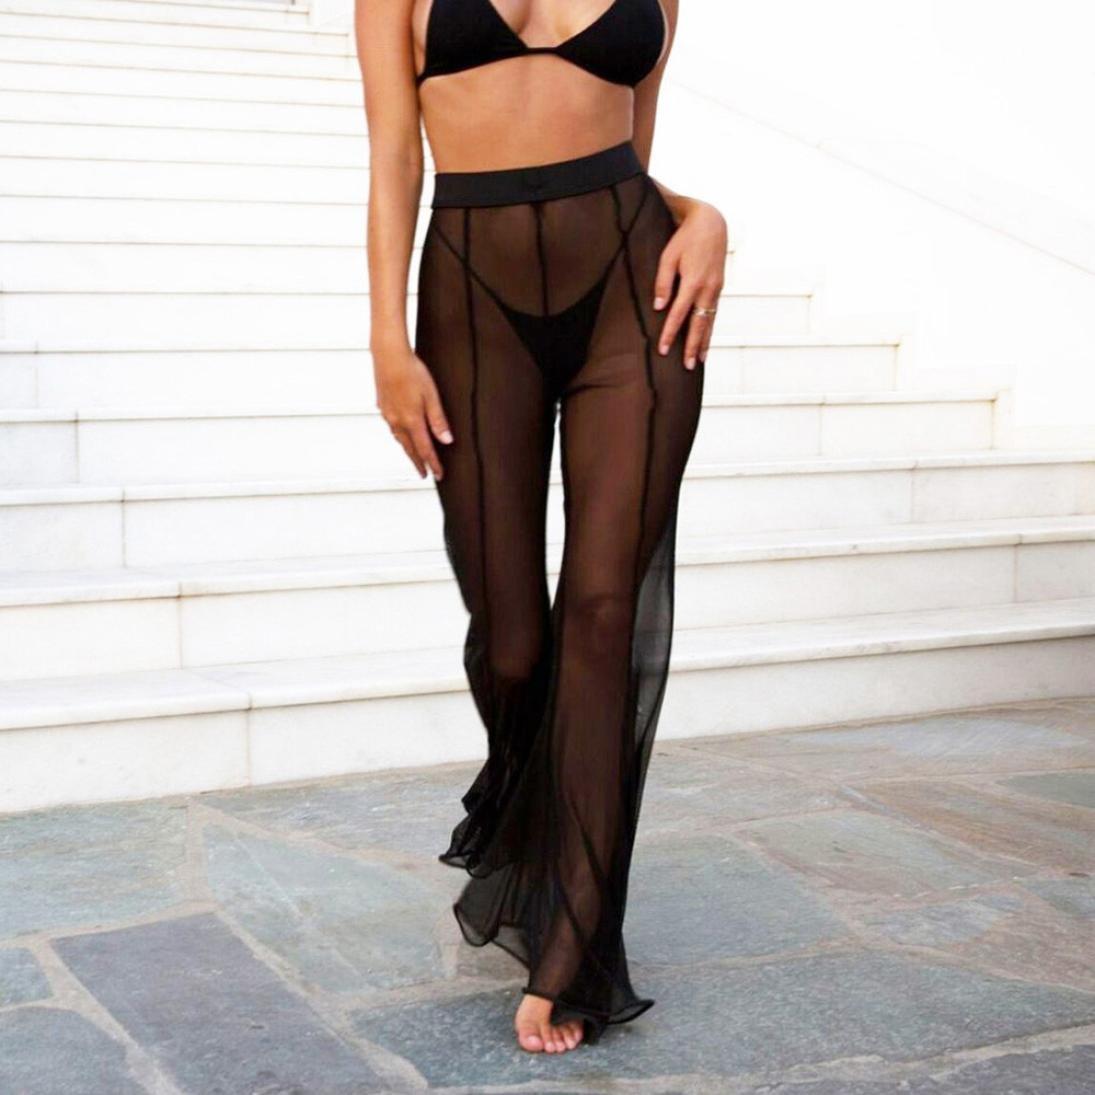 dcf29a215e Women's Beach Mesh Pants, Ladies Sheer Transparent Bikini Cover up Swimwear  Long Pant Trousers at Amazon Women's Clothing store: